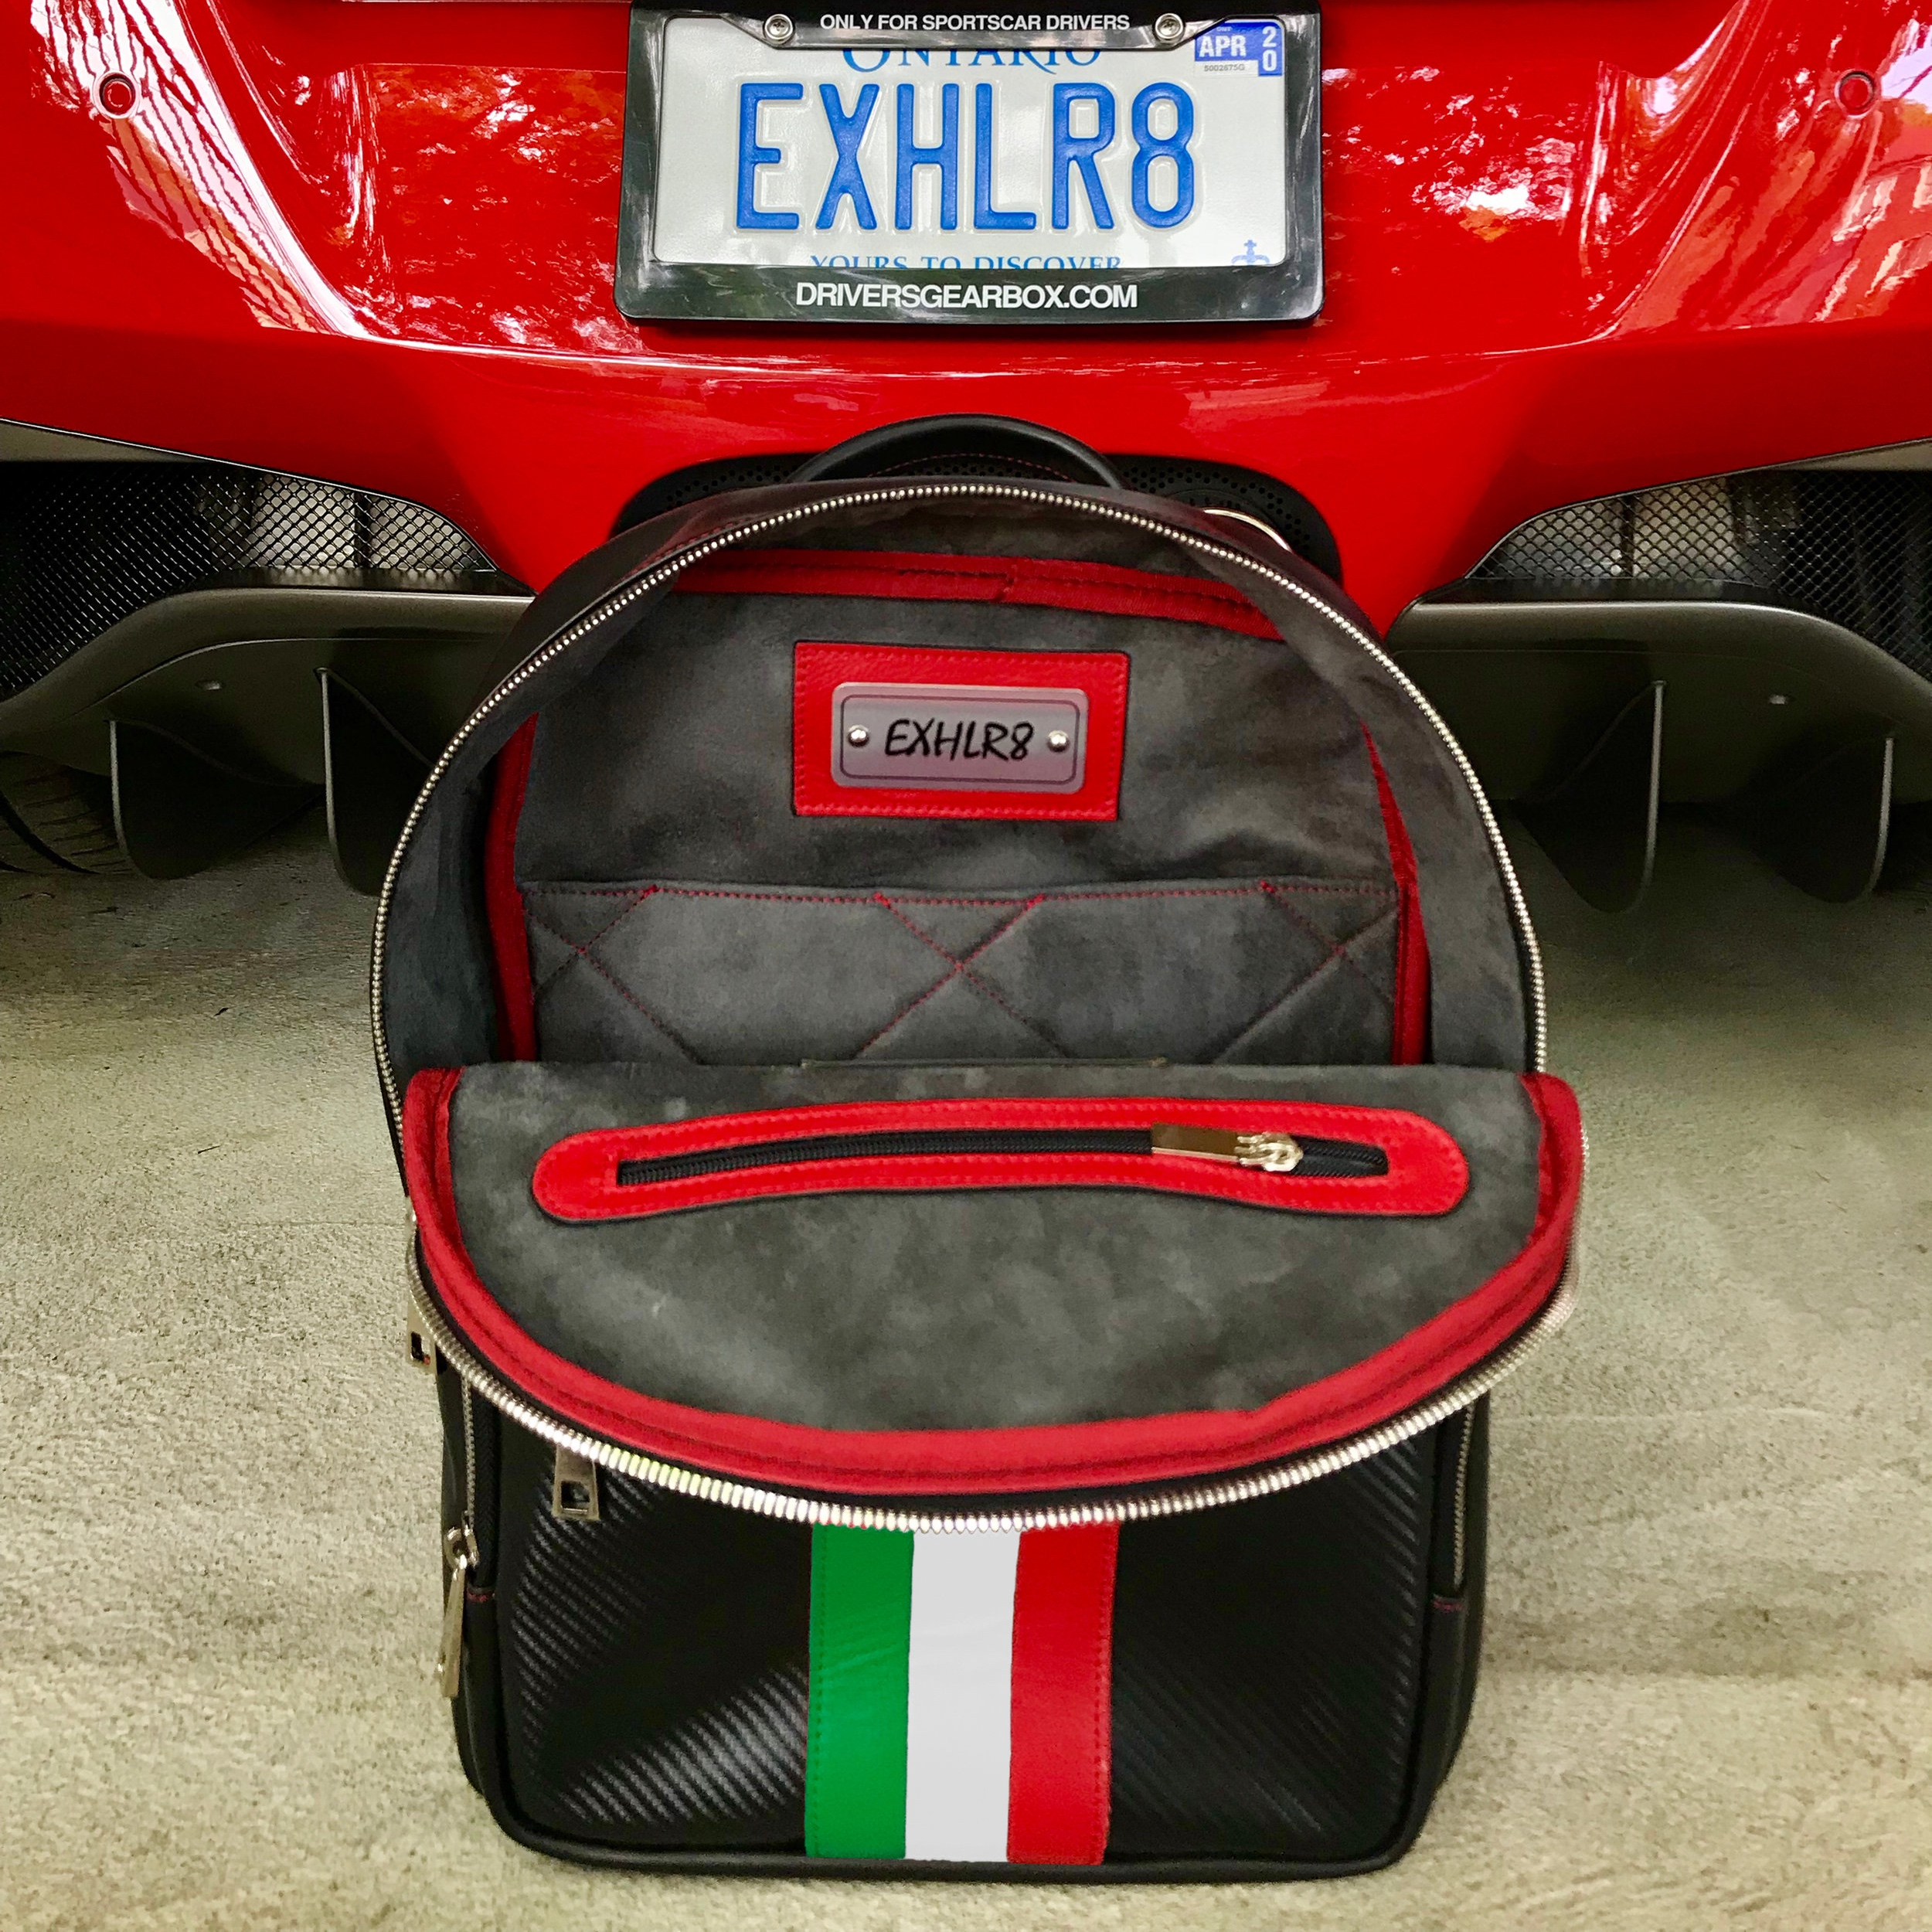 Backpack+interior+exhlr8.jpg